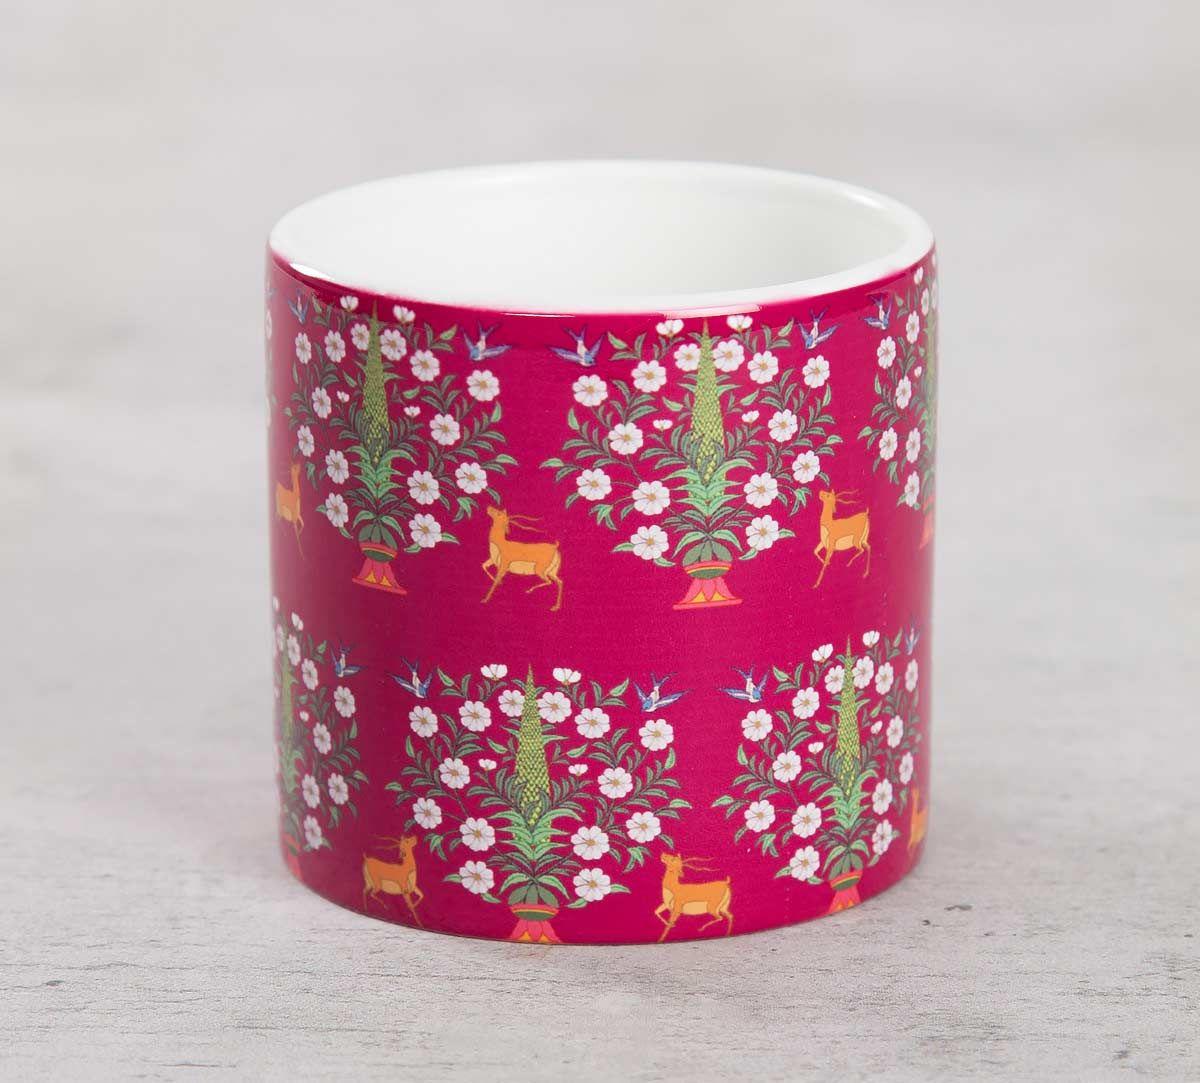 India Circus Deer and Conifer Garden Coffee Mug Small